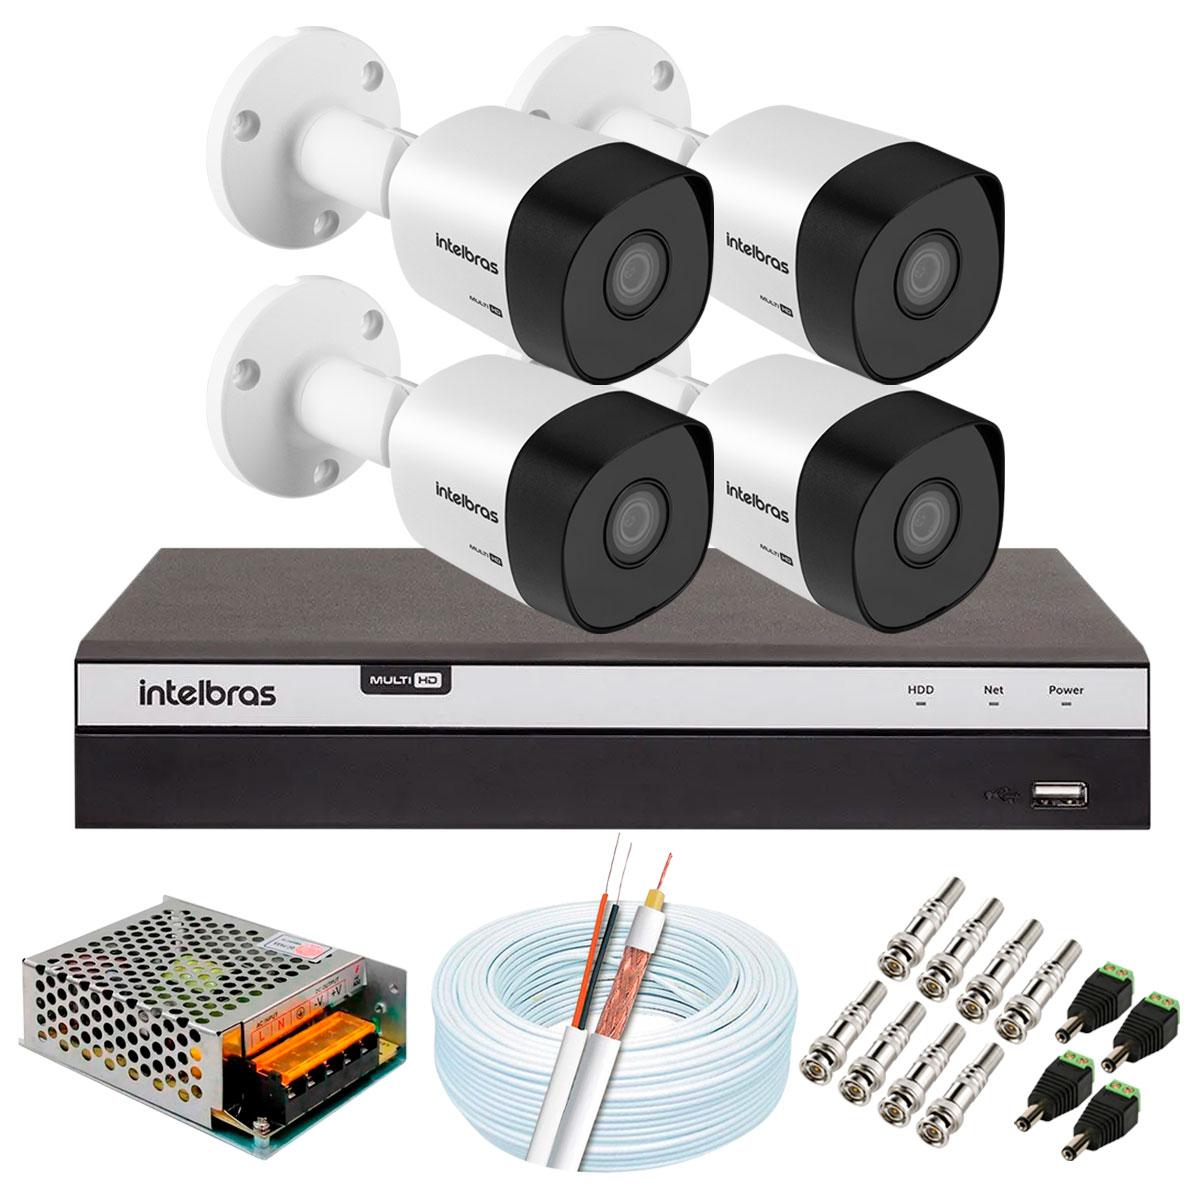 kit-4-cameras-de-seguranca-full-hd-1080p-vhd-3230-b-g5-dvr-intelbras-mhdx-3108-full-hd-de-8-canais-acessorios